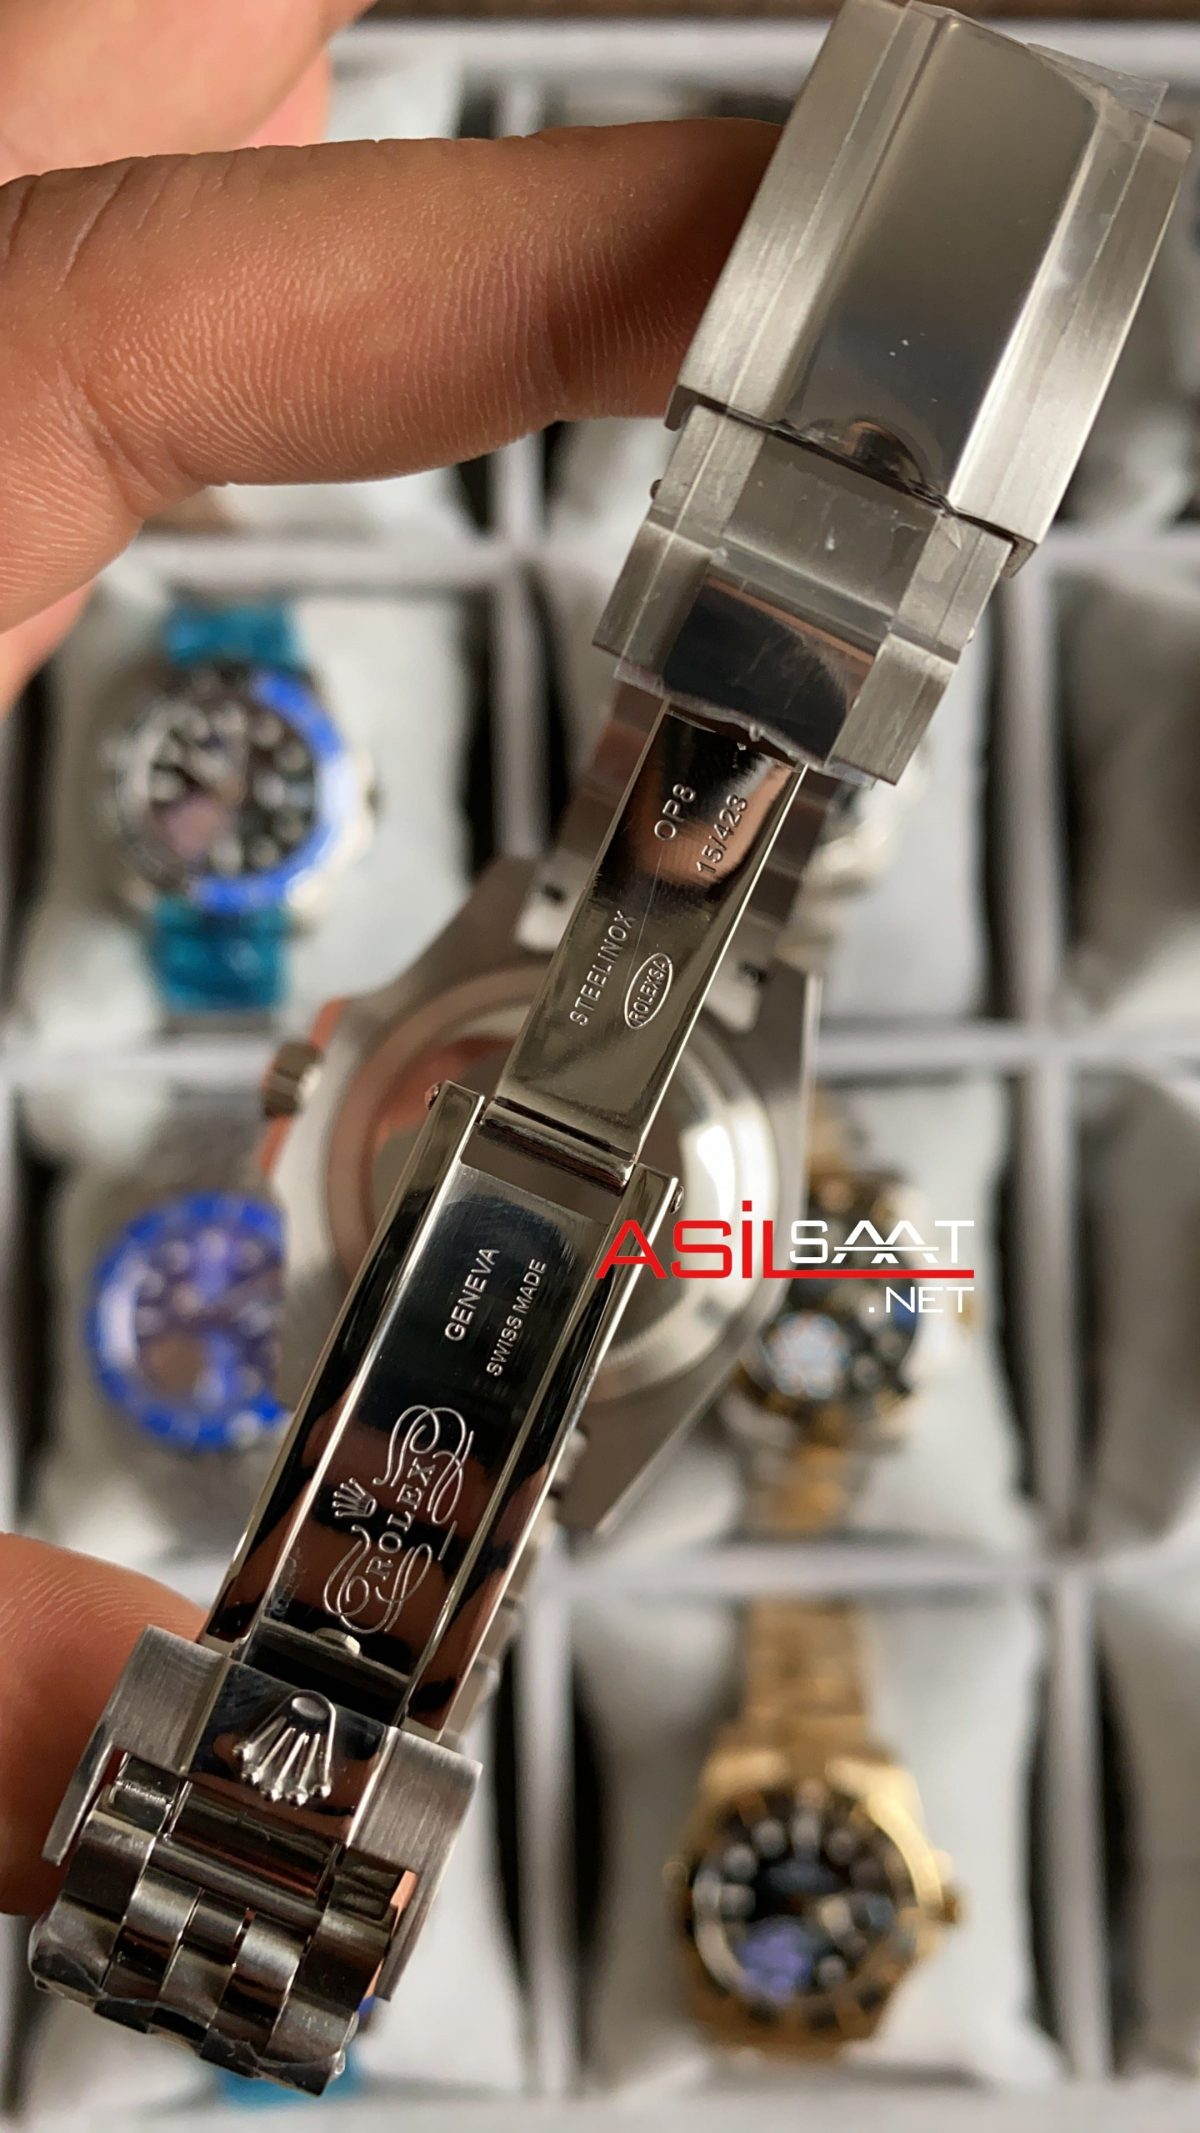 Rolex Jubilee Submariner Hulk 116610 LV ROLS017